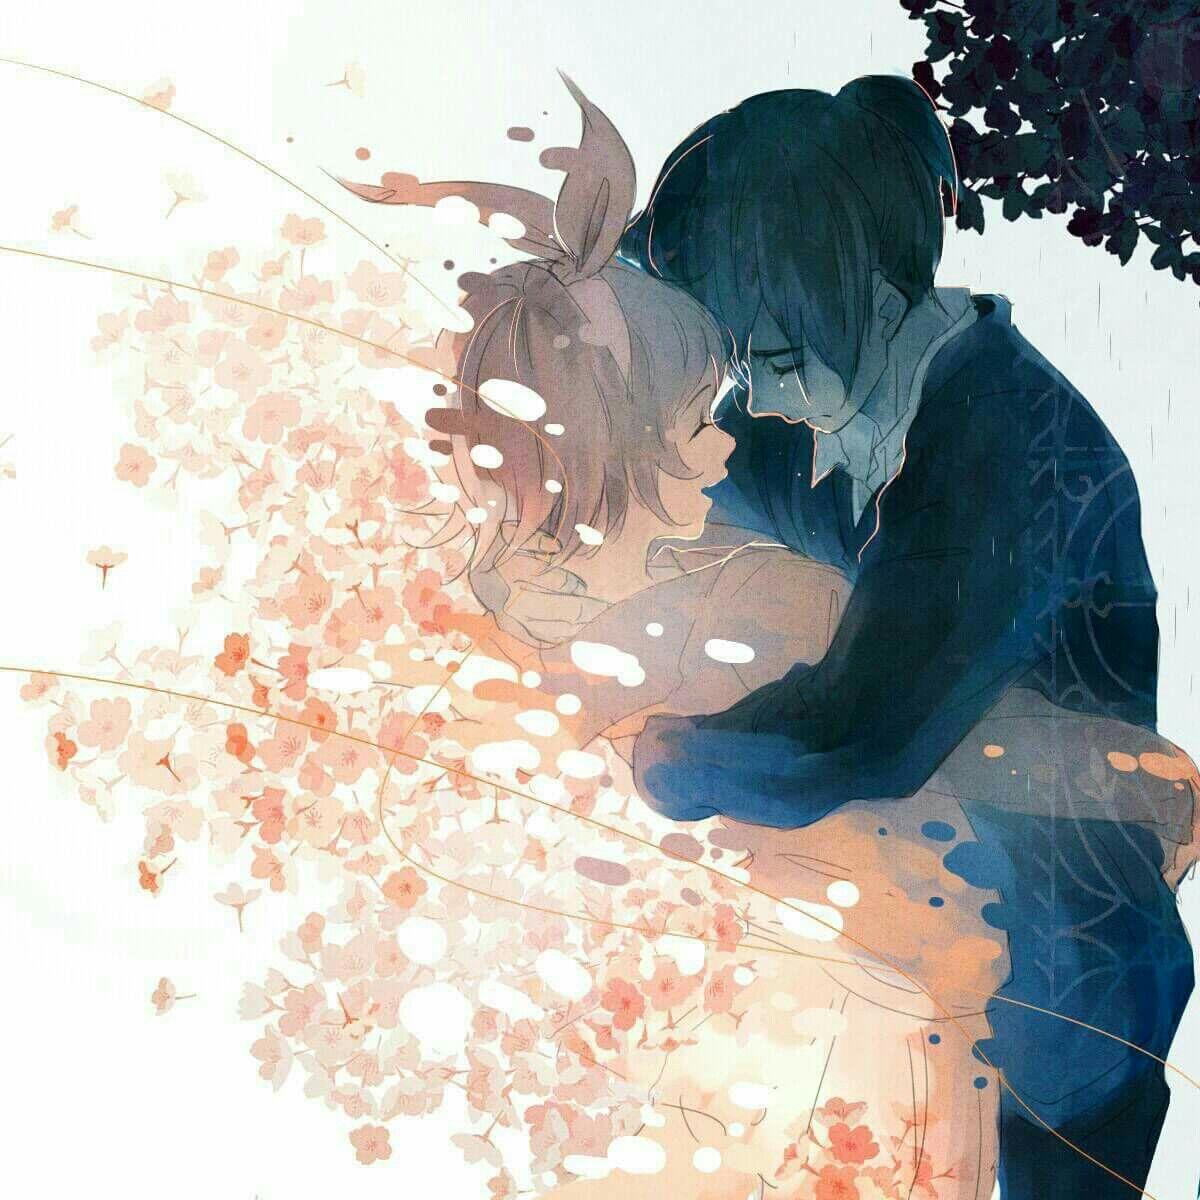 Pin by Taenim on ᴀɴɪᴍᴇ Anime art, Aesthetic anime, Anime